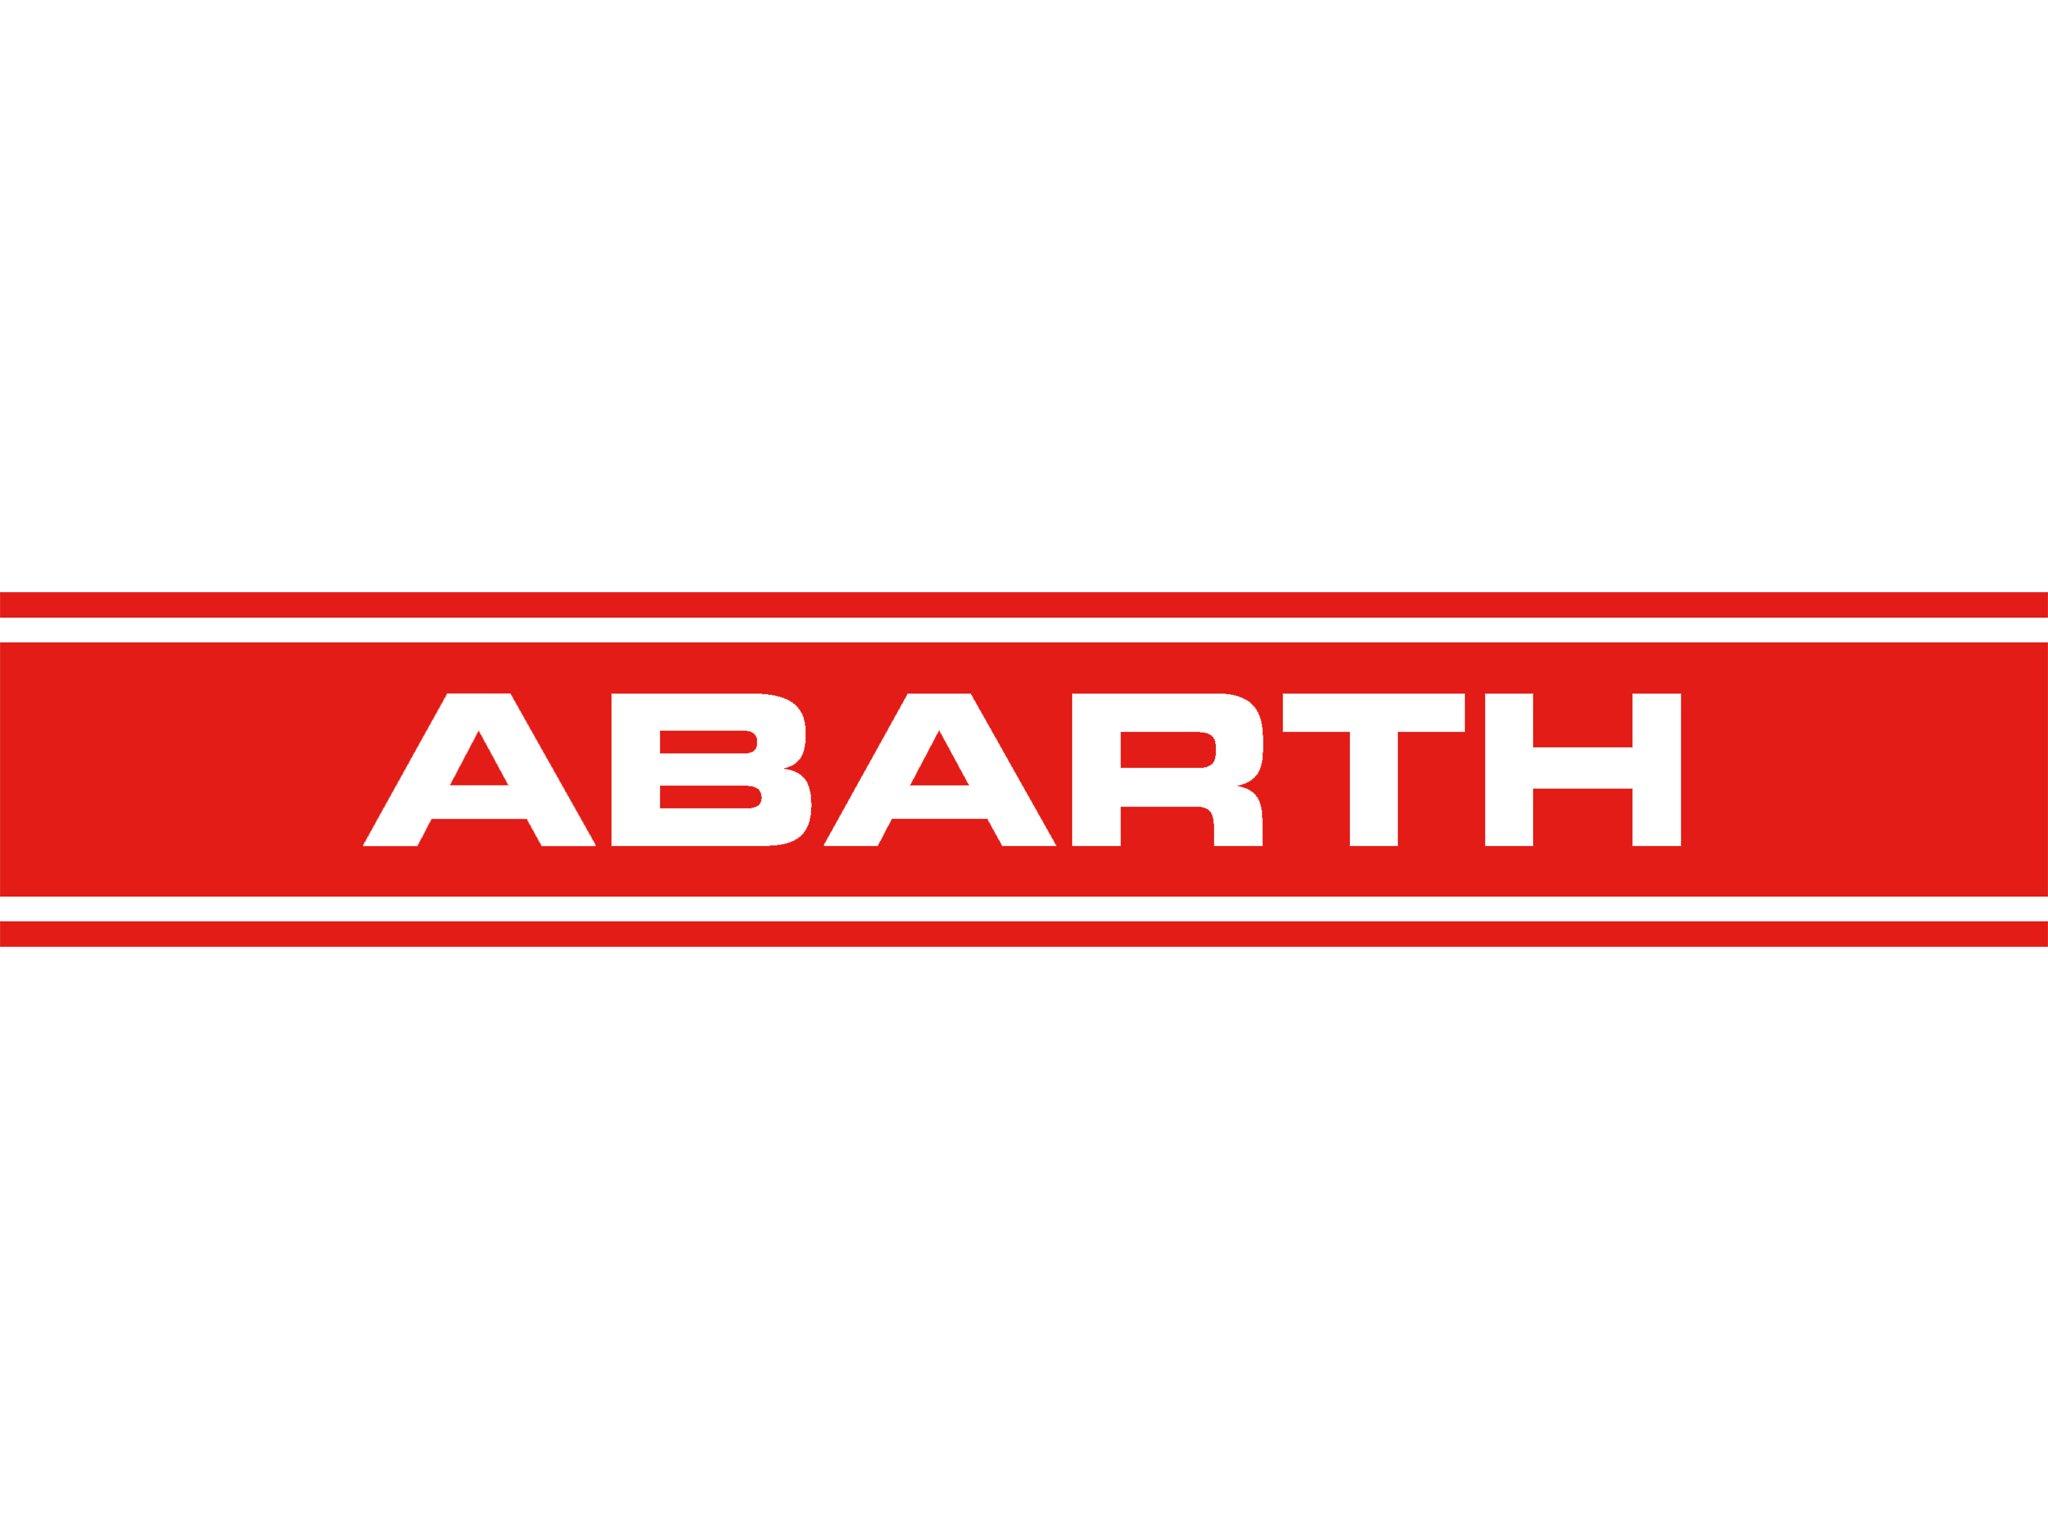 abarth-logo - Programma auto Piacenza